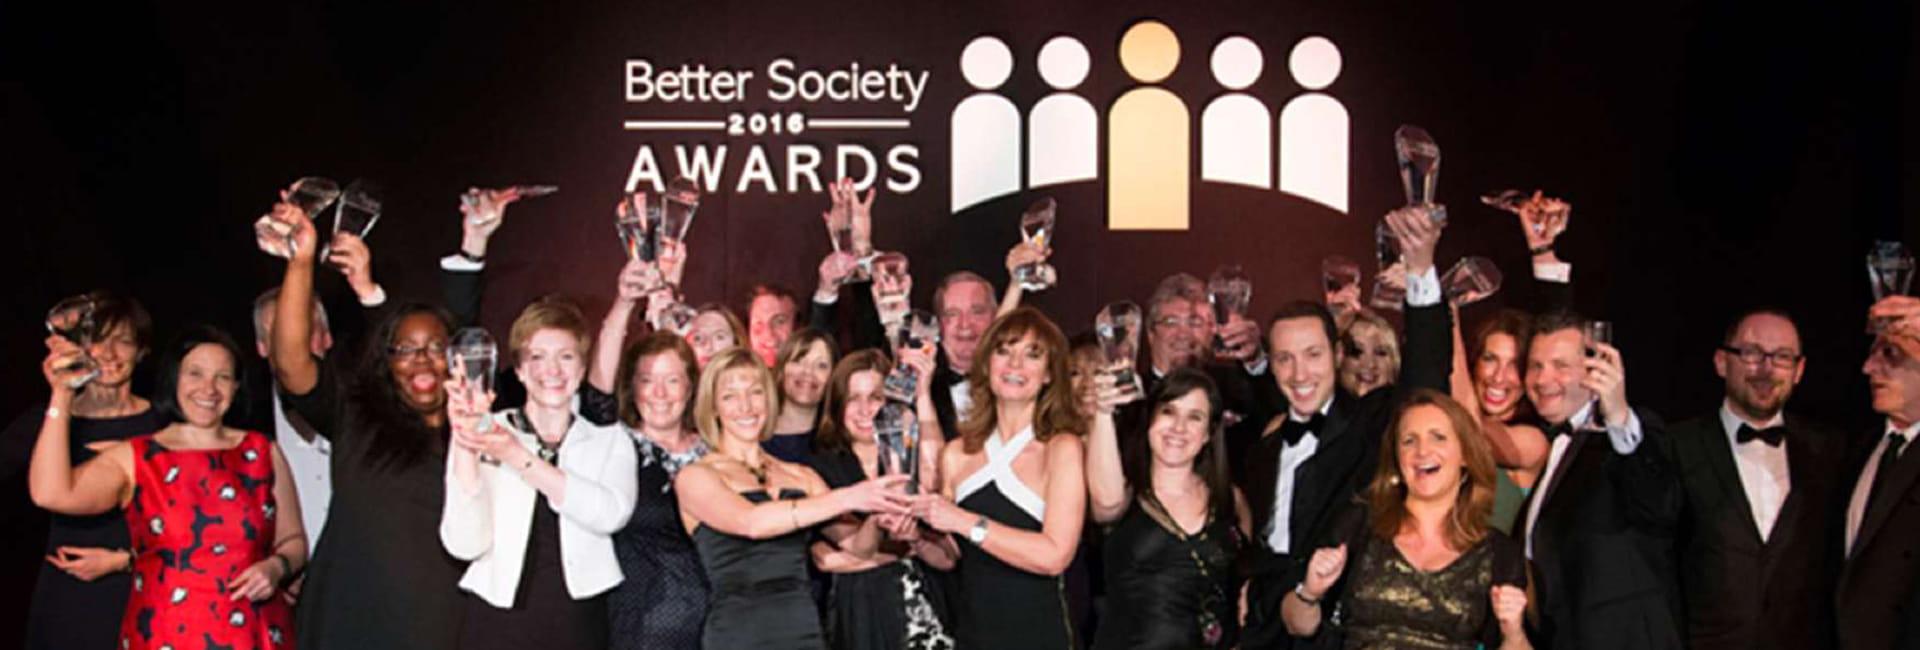 Better Society Awards